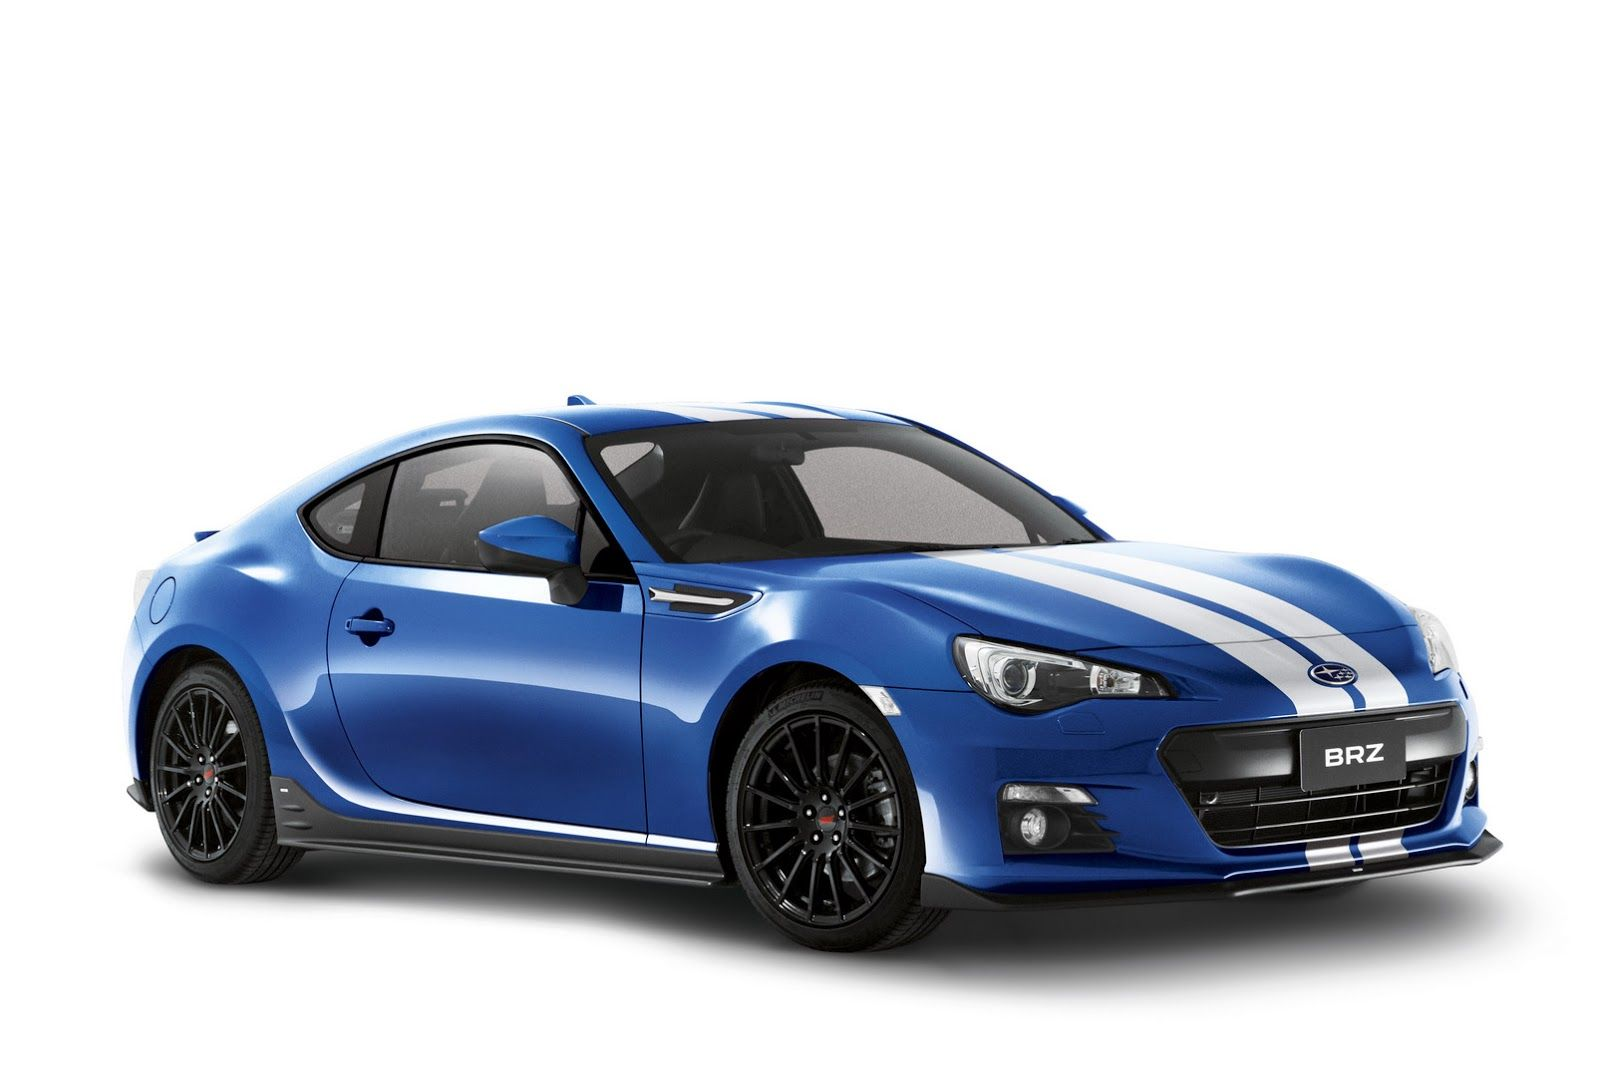 Subaru Gives Brz A Striped Special Edition With Sti Goods For Australia Carscoops Subaru Brz Subaru Sports Cars Luxury